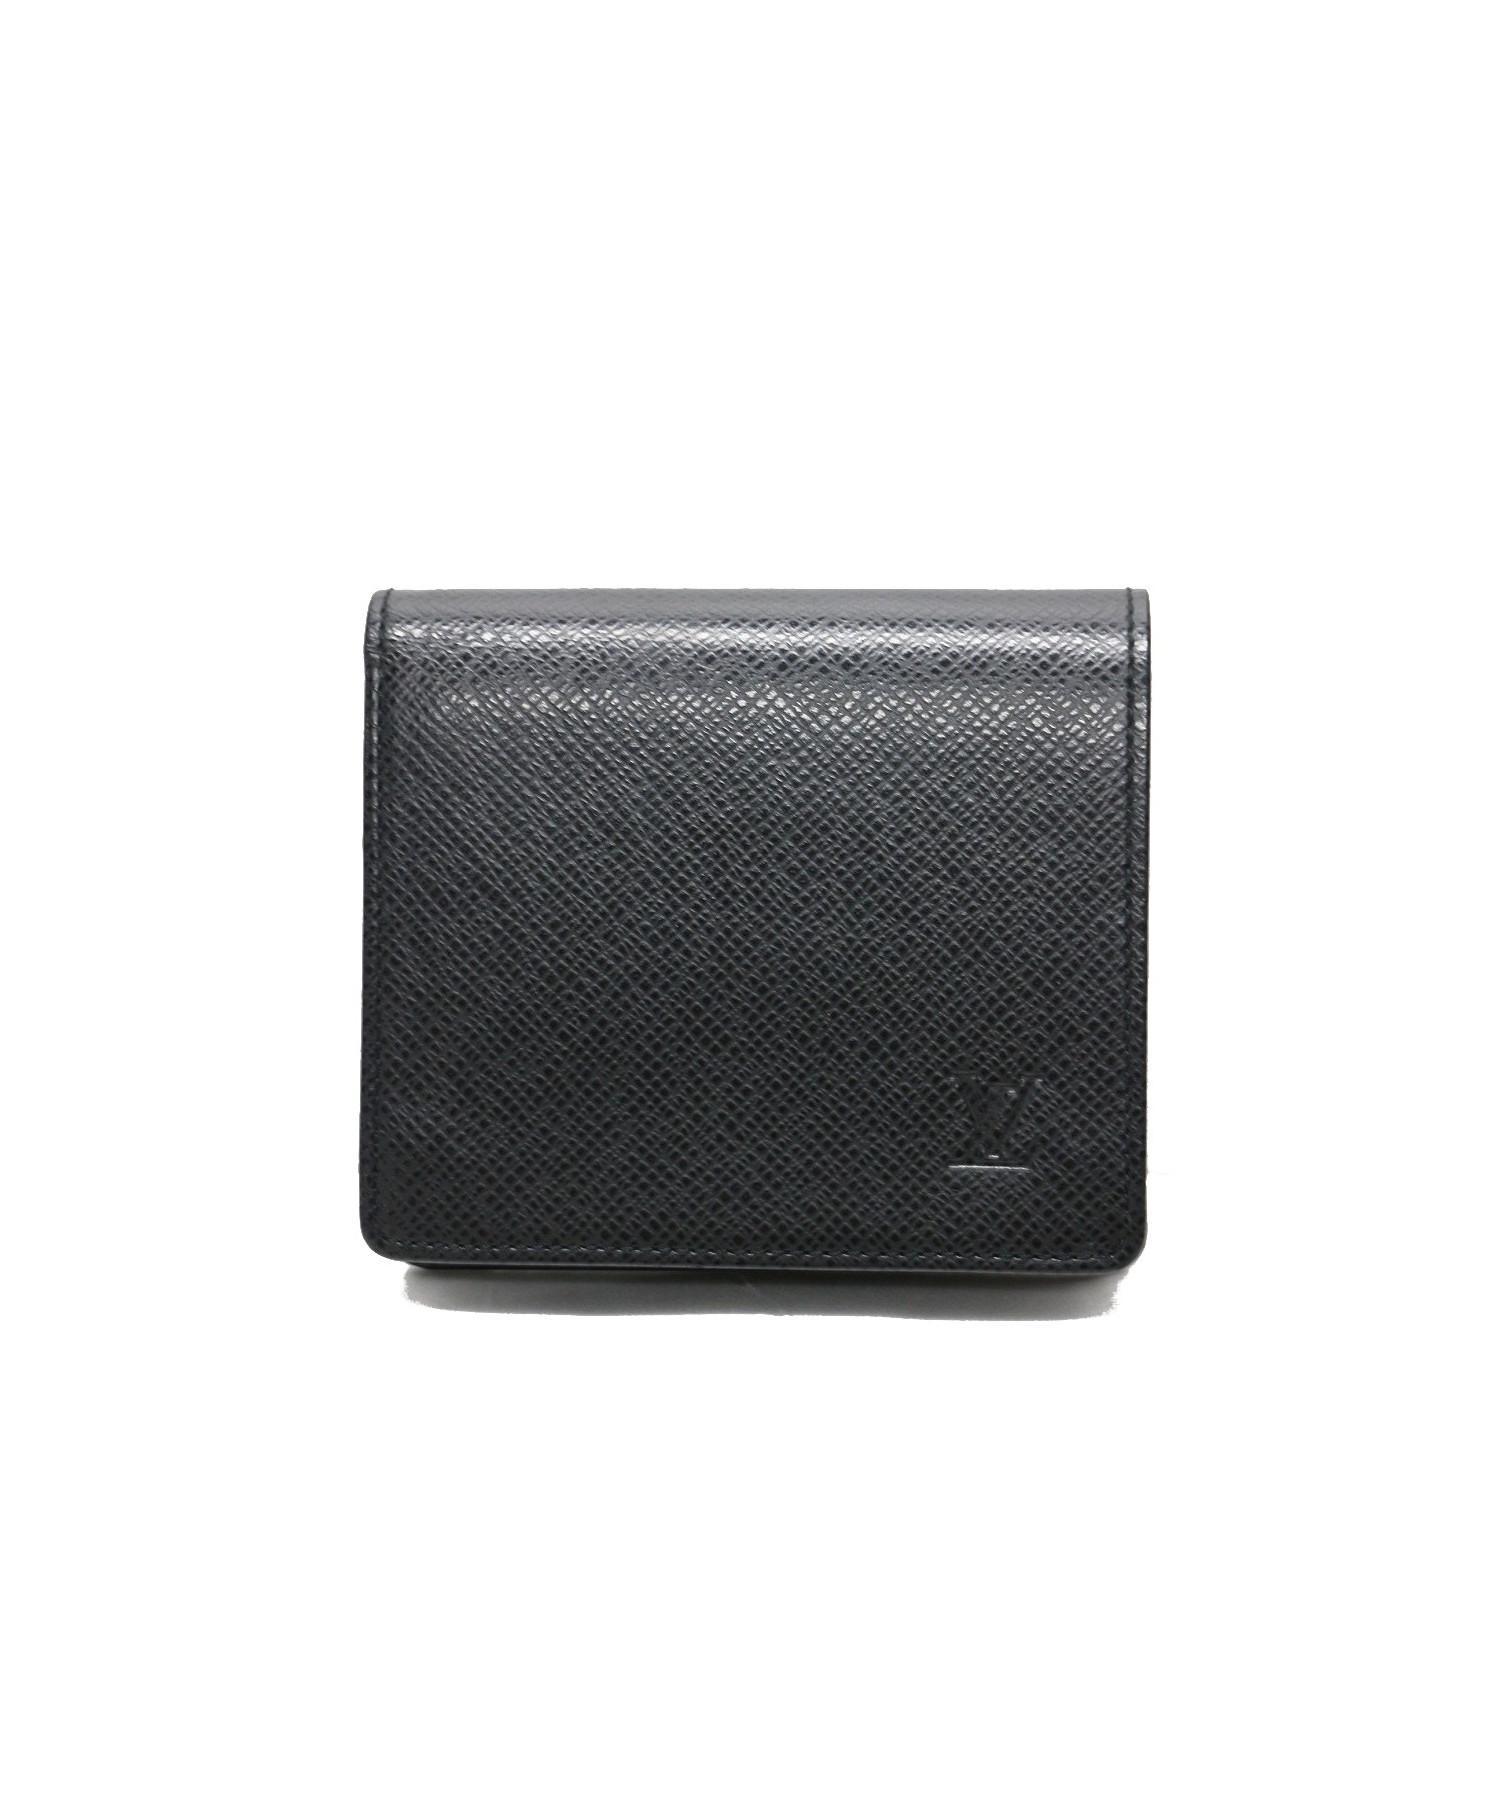 wholesale dealer 5f5d3 f1080 [中古]LOUIS VUITTON(ルイ・ヴィトン)のメンズ 服飾小物 2つ折り財布